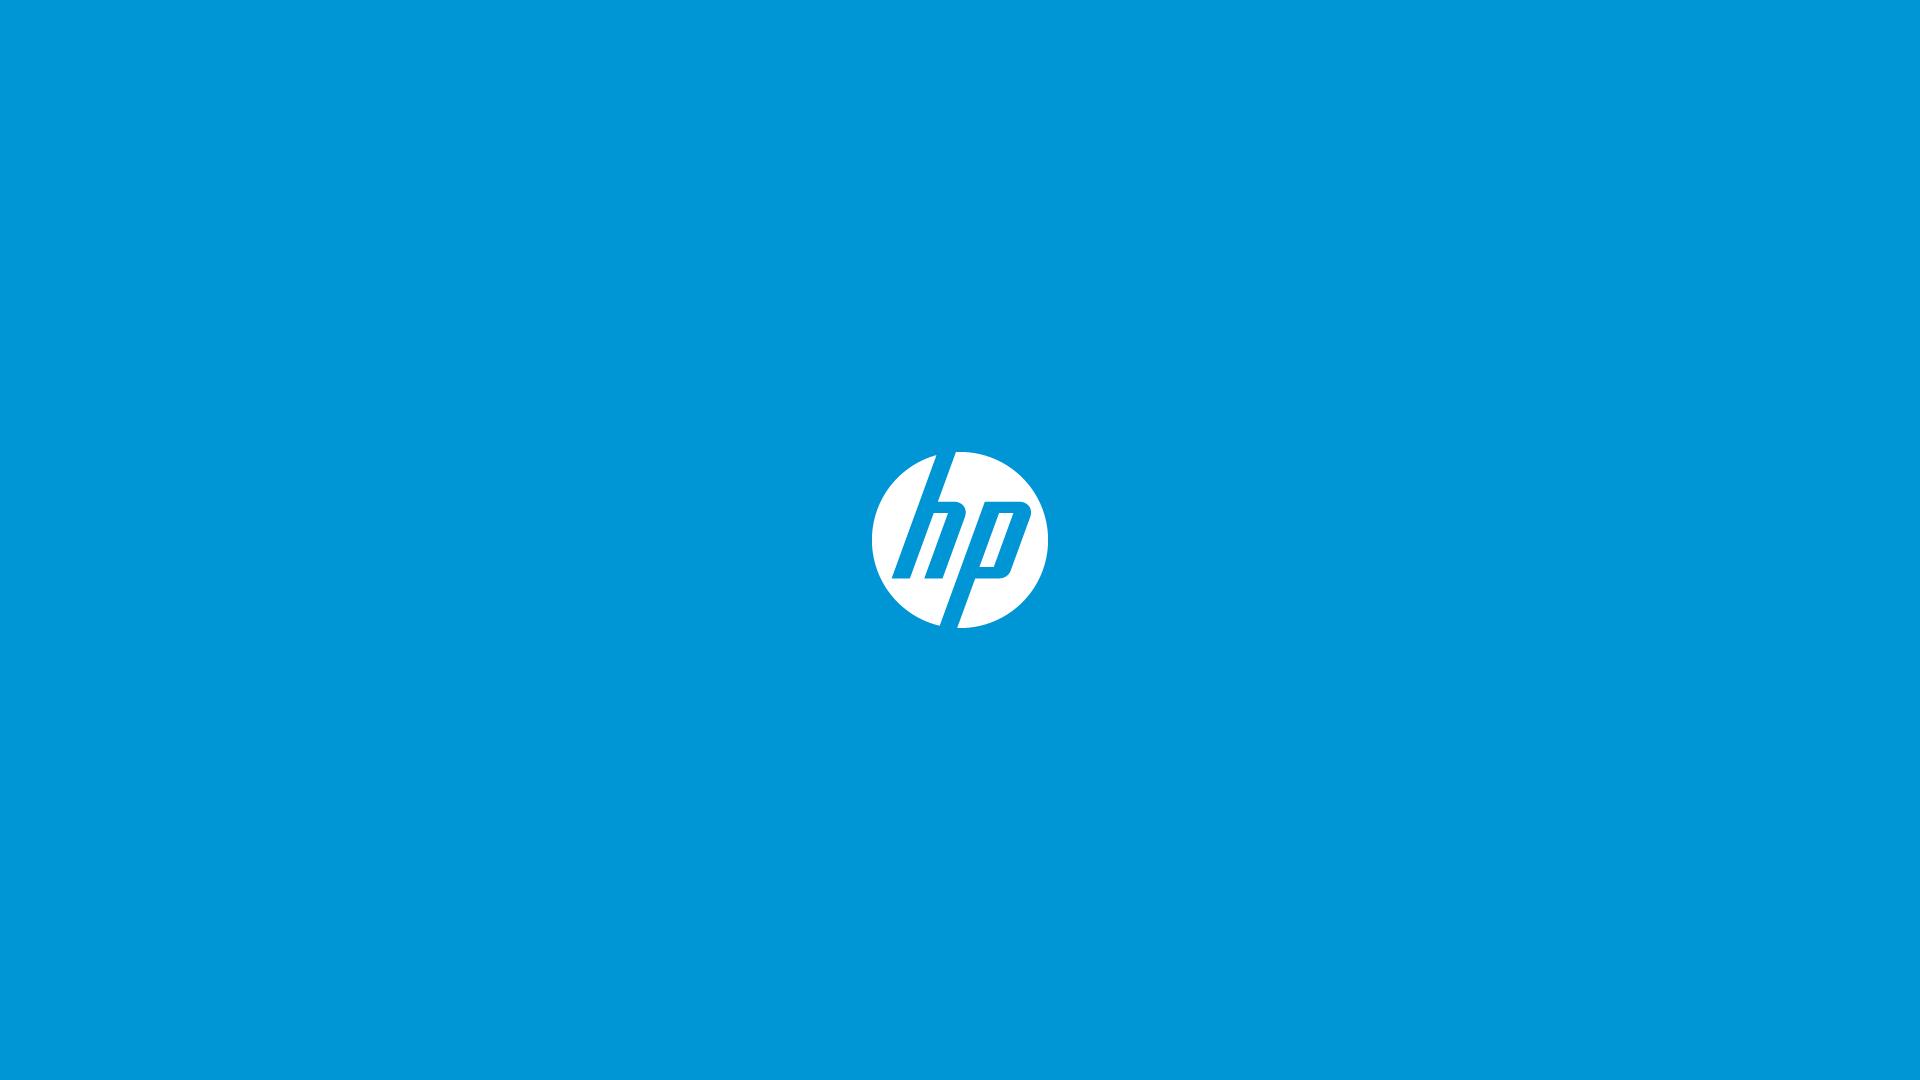 HP_wallpaper_1920x1080